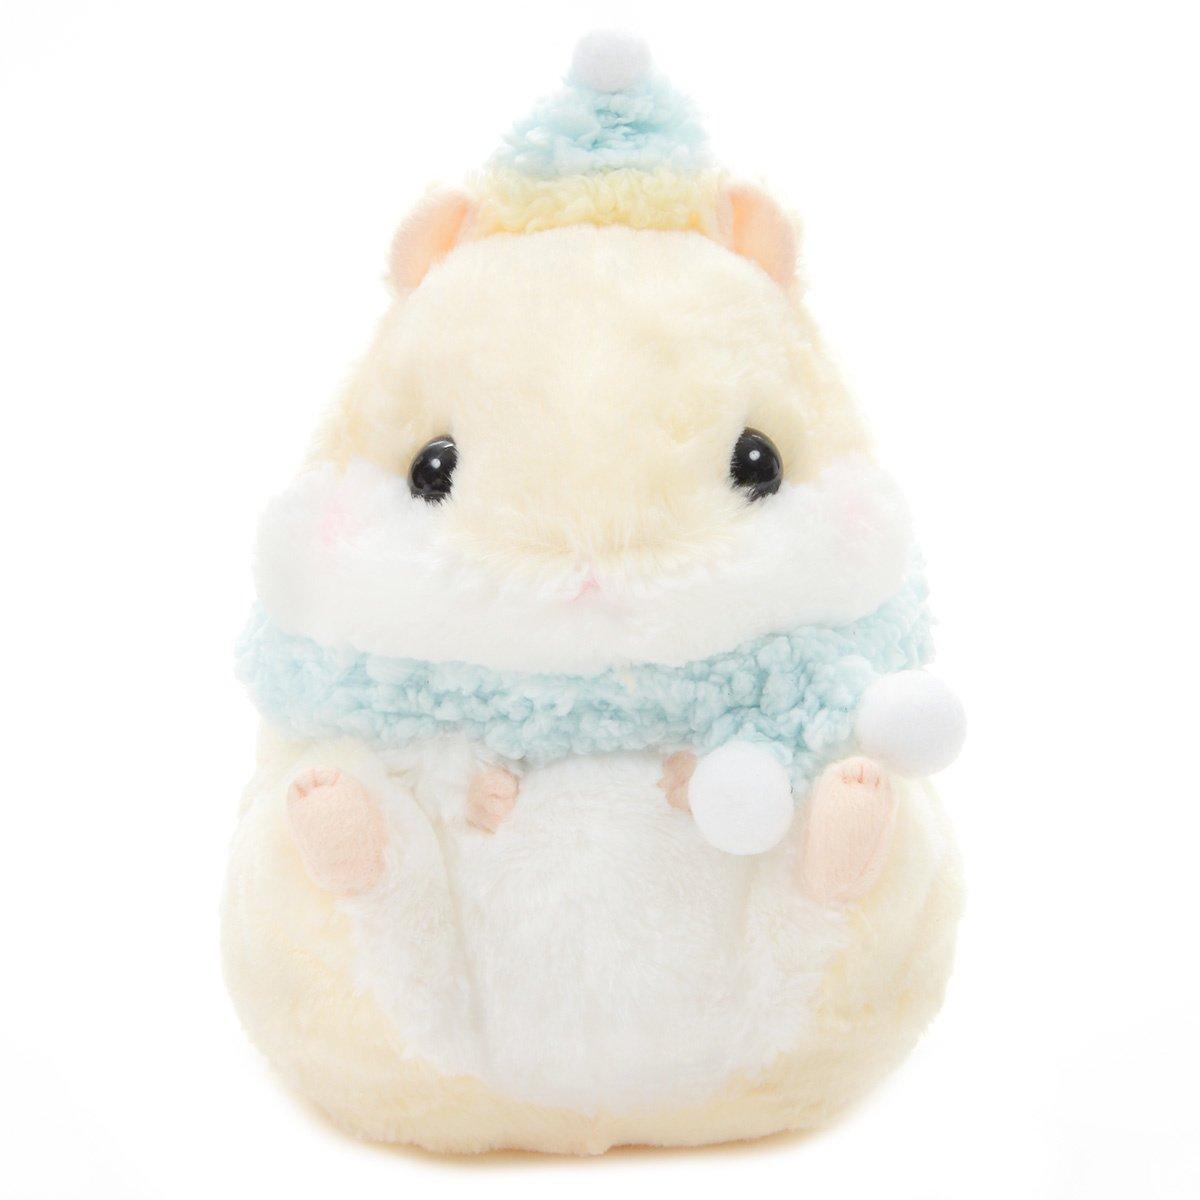 Hamster Plush Doll Amuse Coroham Coron Winter Plush Collection Purin Beige Jumbo 10 Inches